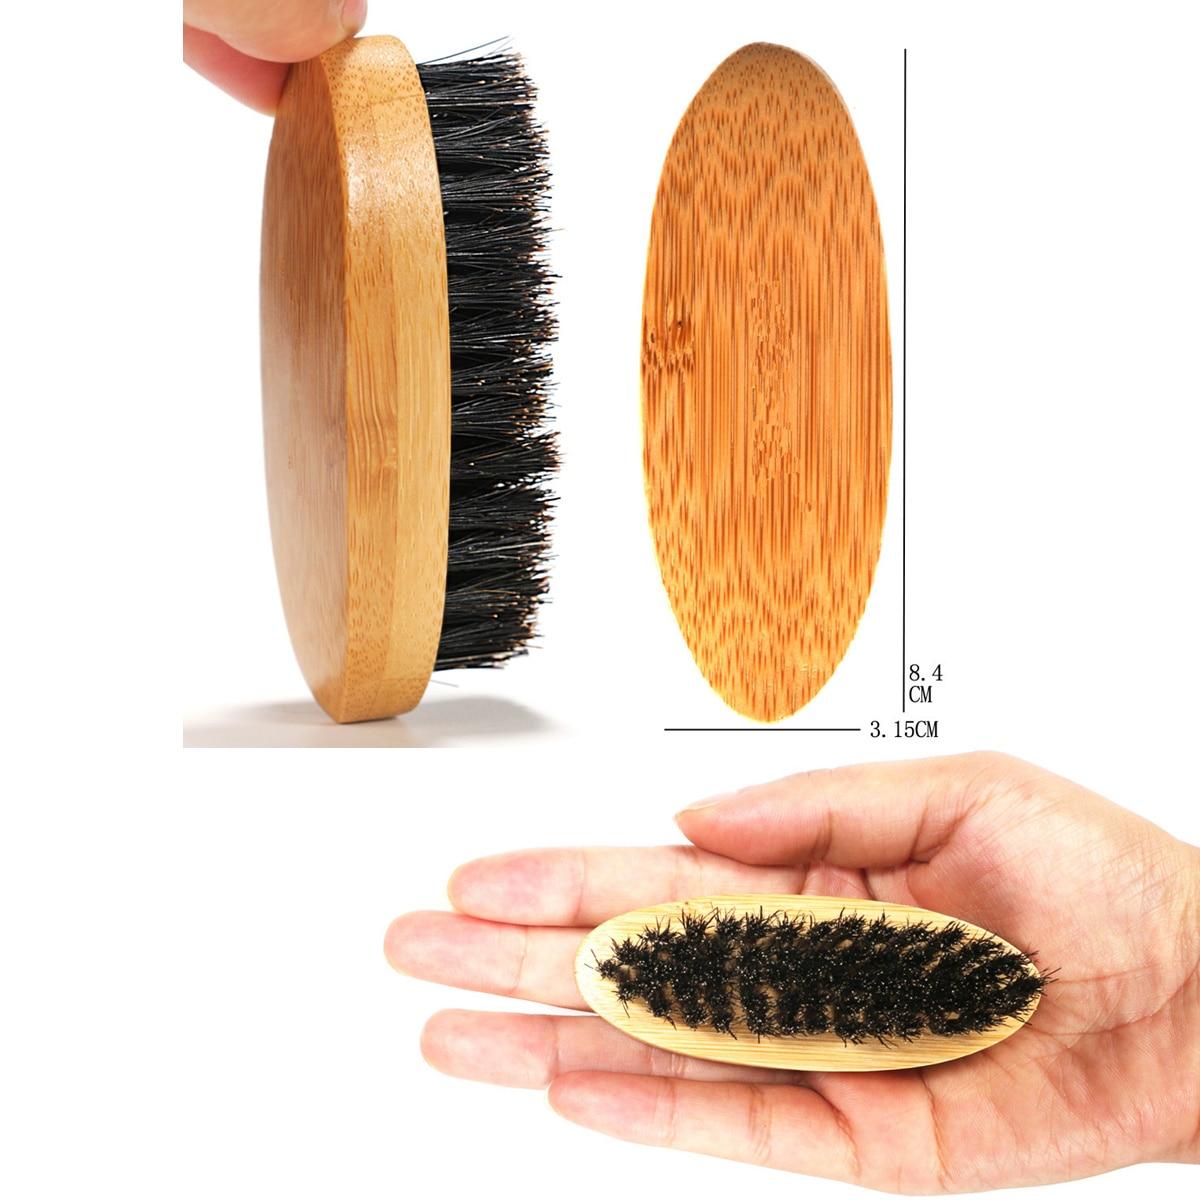 1pcs Mini Men Beard Brush Mustache Combs Hair Brush Bamboo Handle Boar Bristle Mustache Styling Detangling for Beard Comb